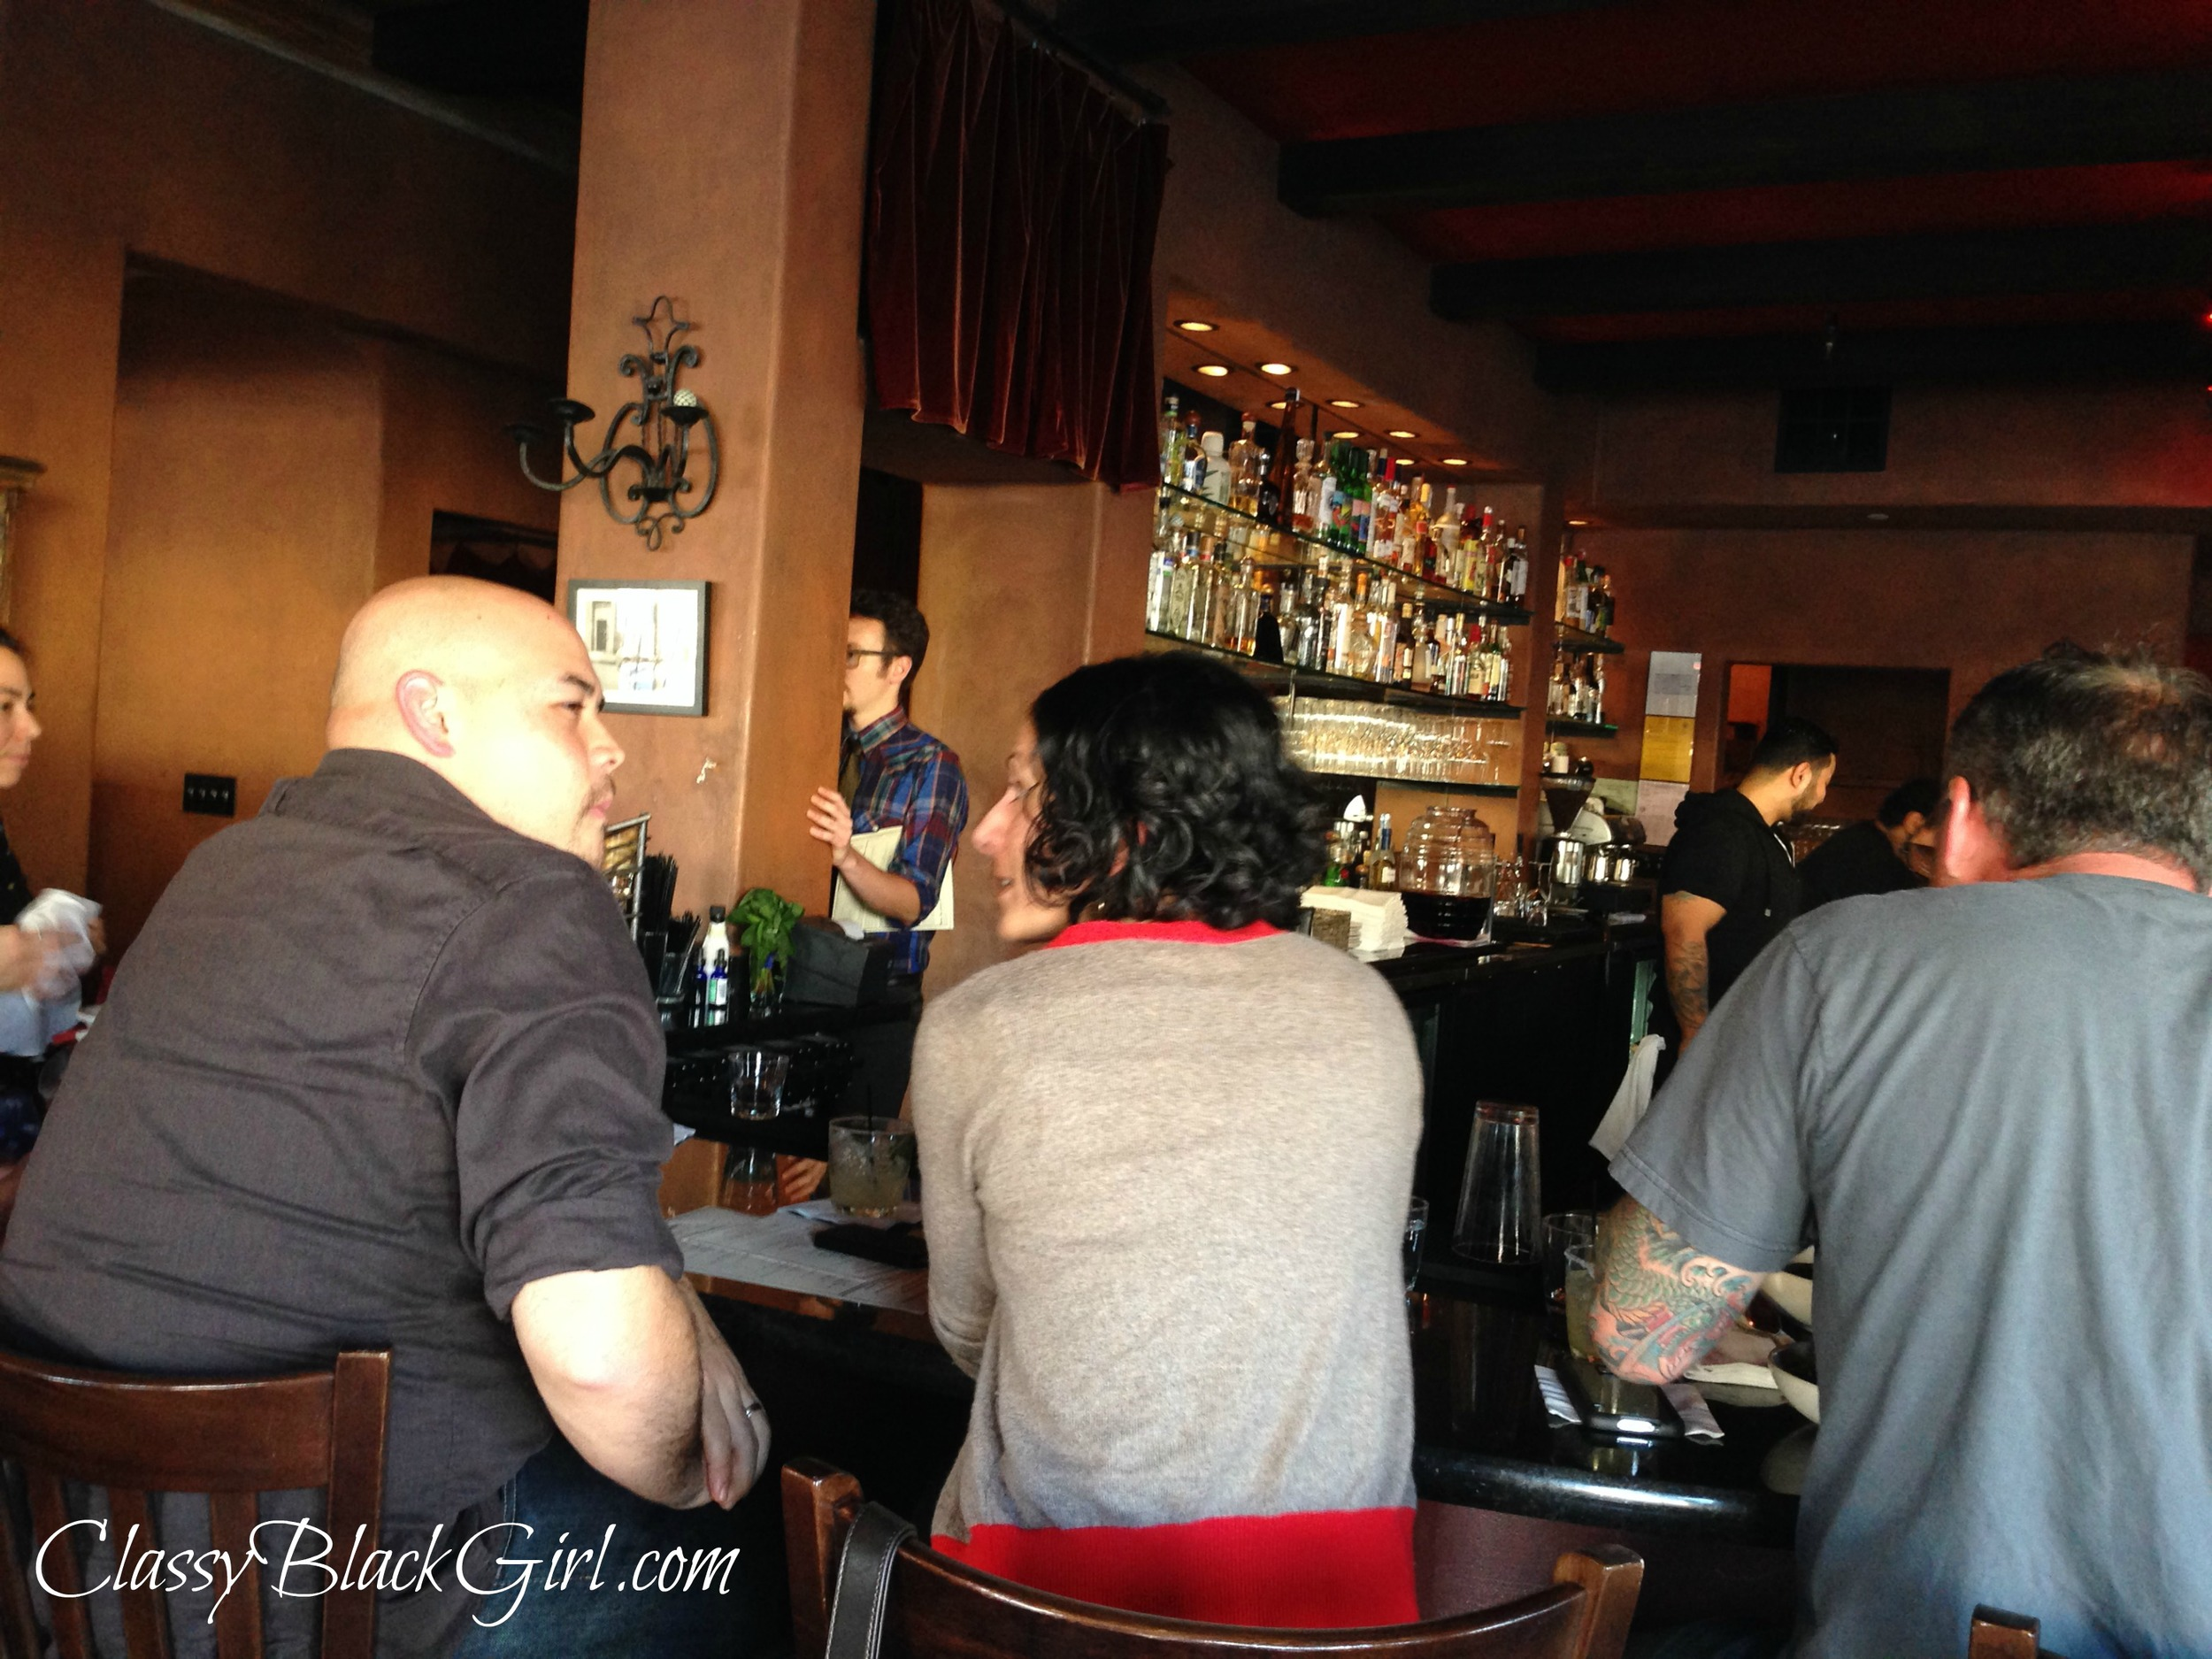 Diverse Bar Scene, Rumbo Al Sur, Oakland, Restaurant, Food, Food Review, ClassyBlackGirl.com, Sharelle D. Lowery